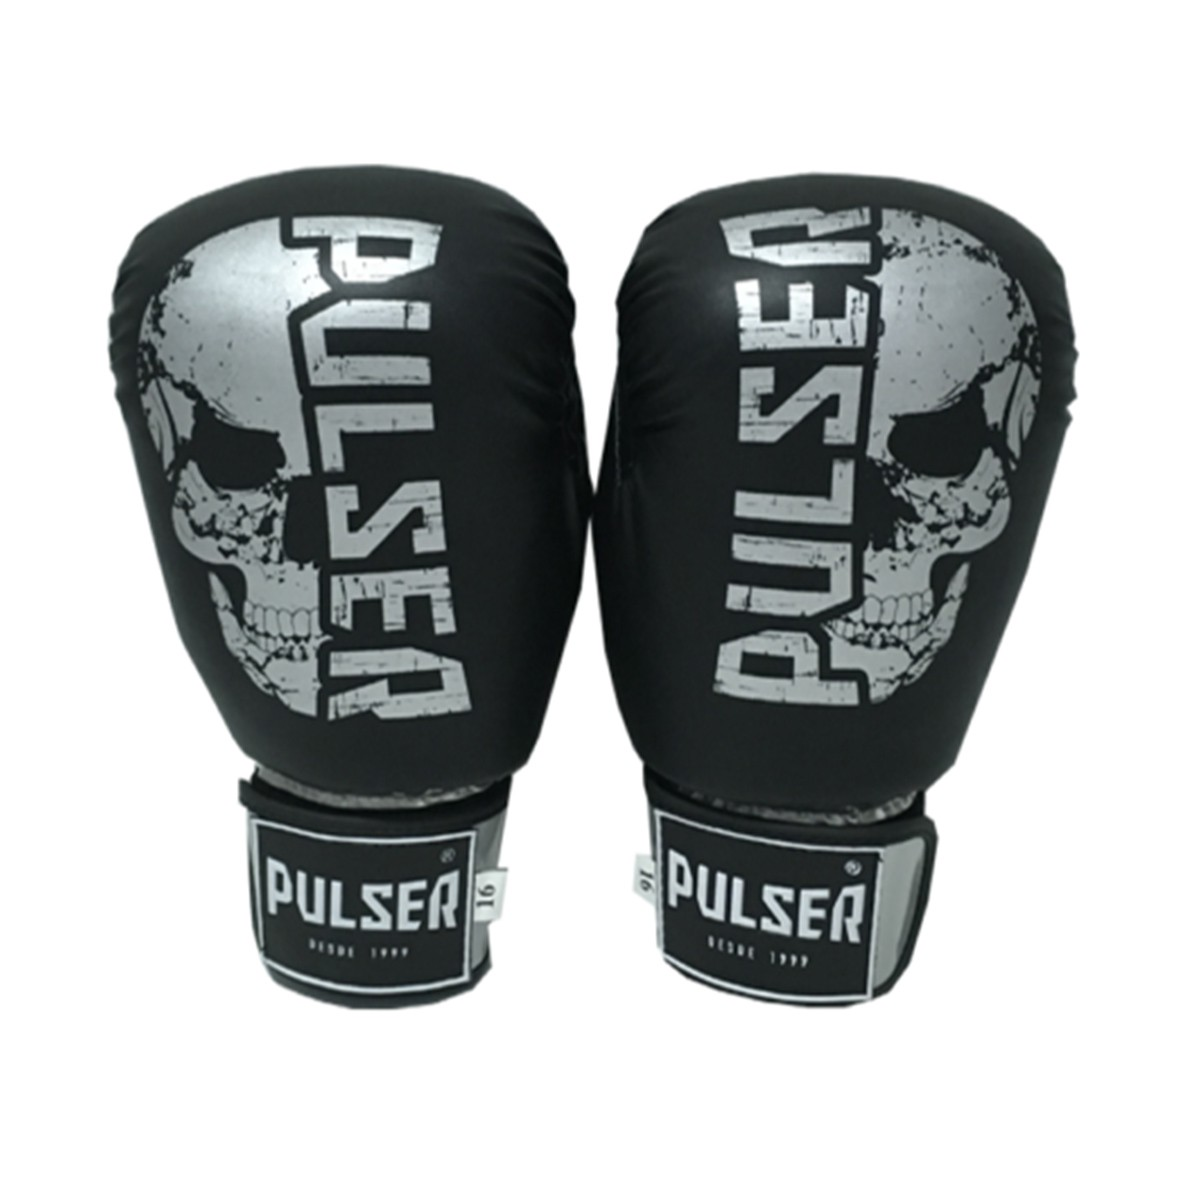 Kit de Muay Thai / Kickboxing 12oz - Preto e Prata Caveira - Pulser  - PRALUTA SHOP